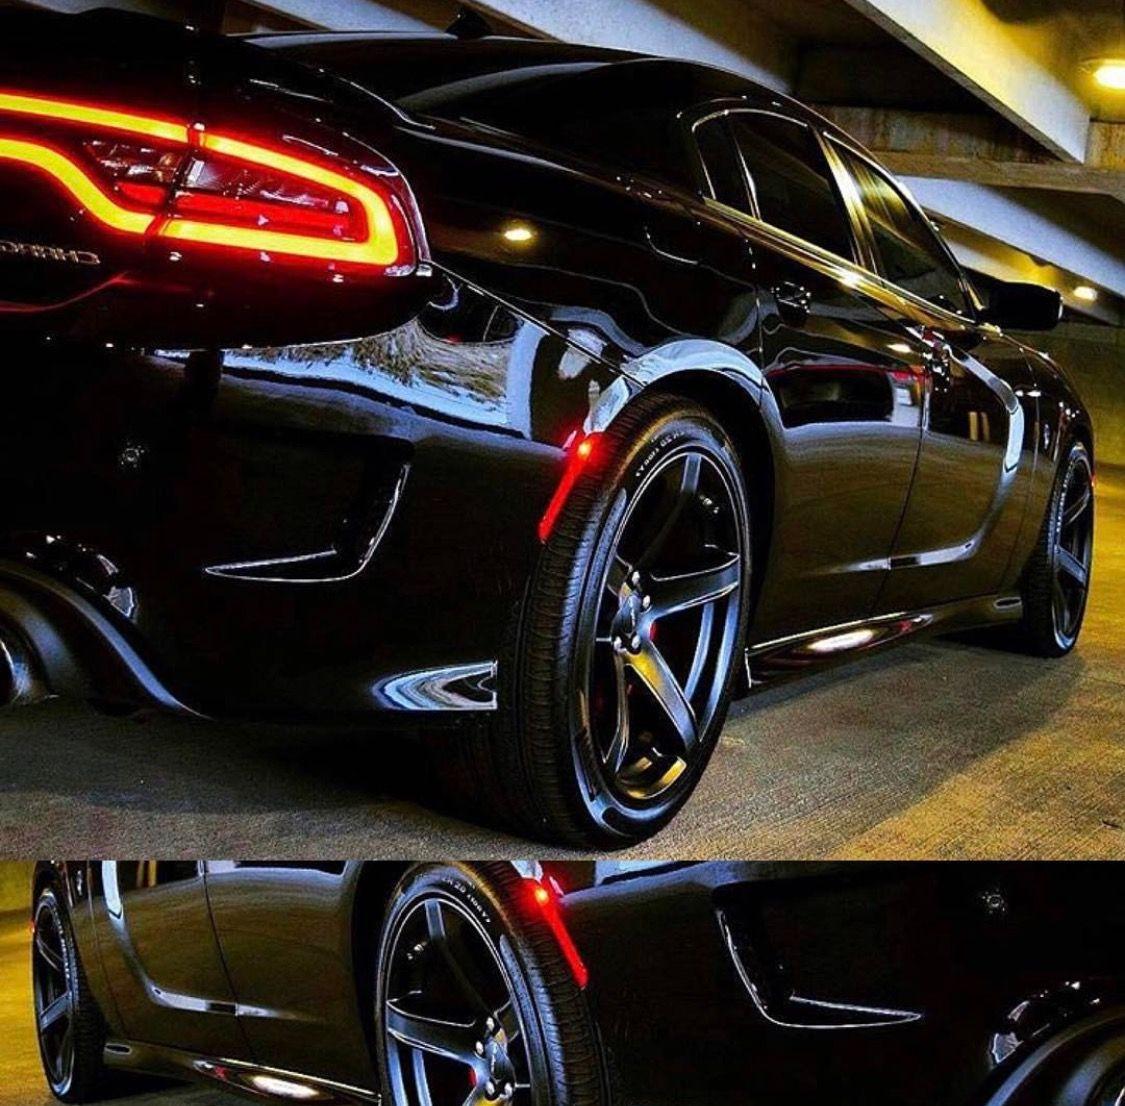 Epl중계nhl중계 하키중계 Nba중계 프리미어리그중계 스포츠중계 Www Bbtv24 Com 실시간스포츠중계 해외축구중계 해외스포츠중계 Dodge Charger Hellcat Dodge Charger Dodge Muscle Cars